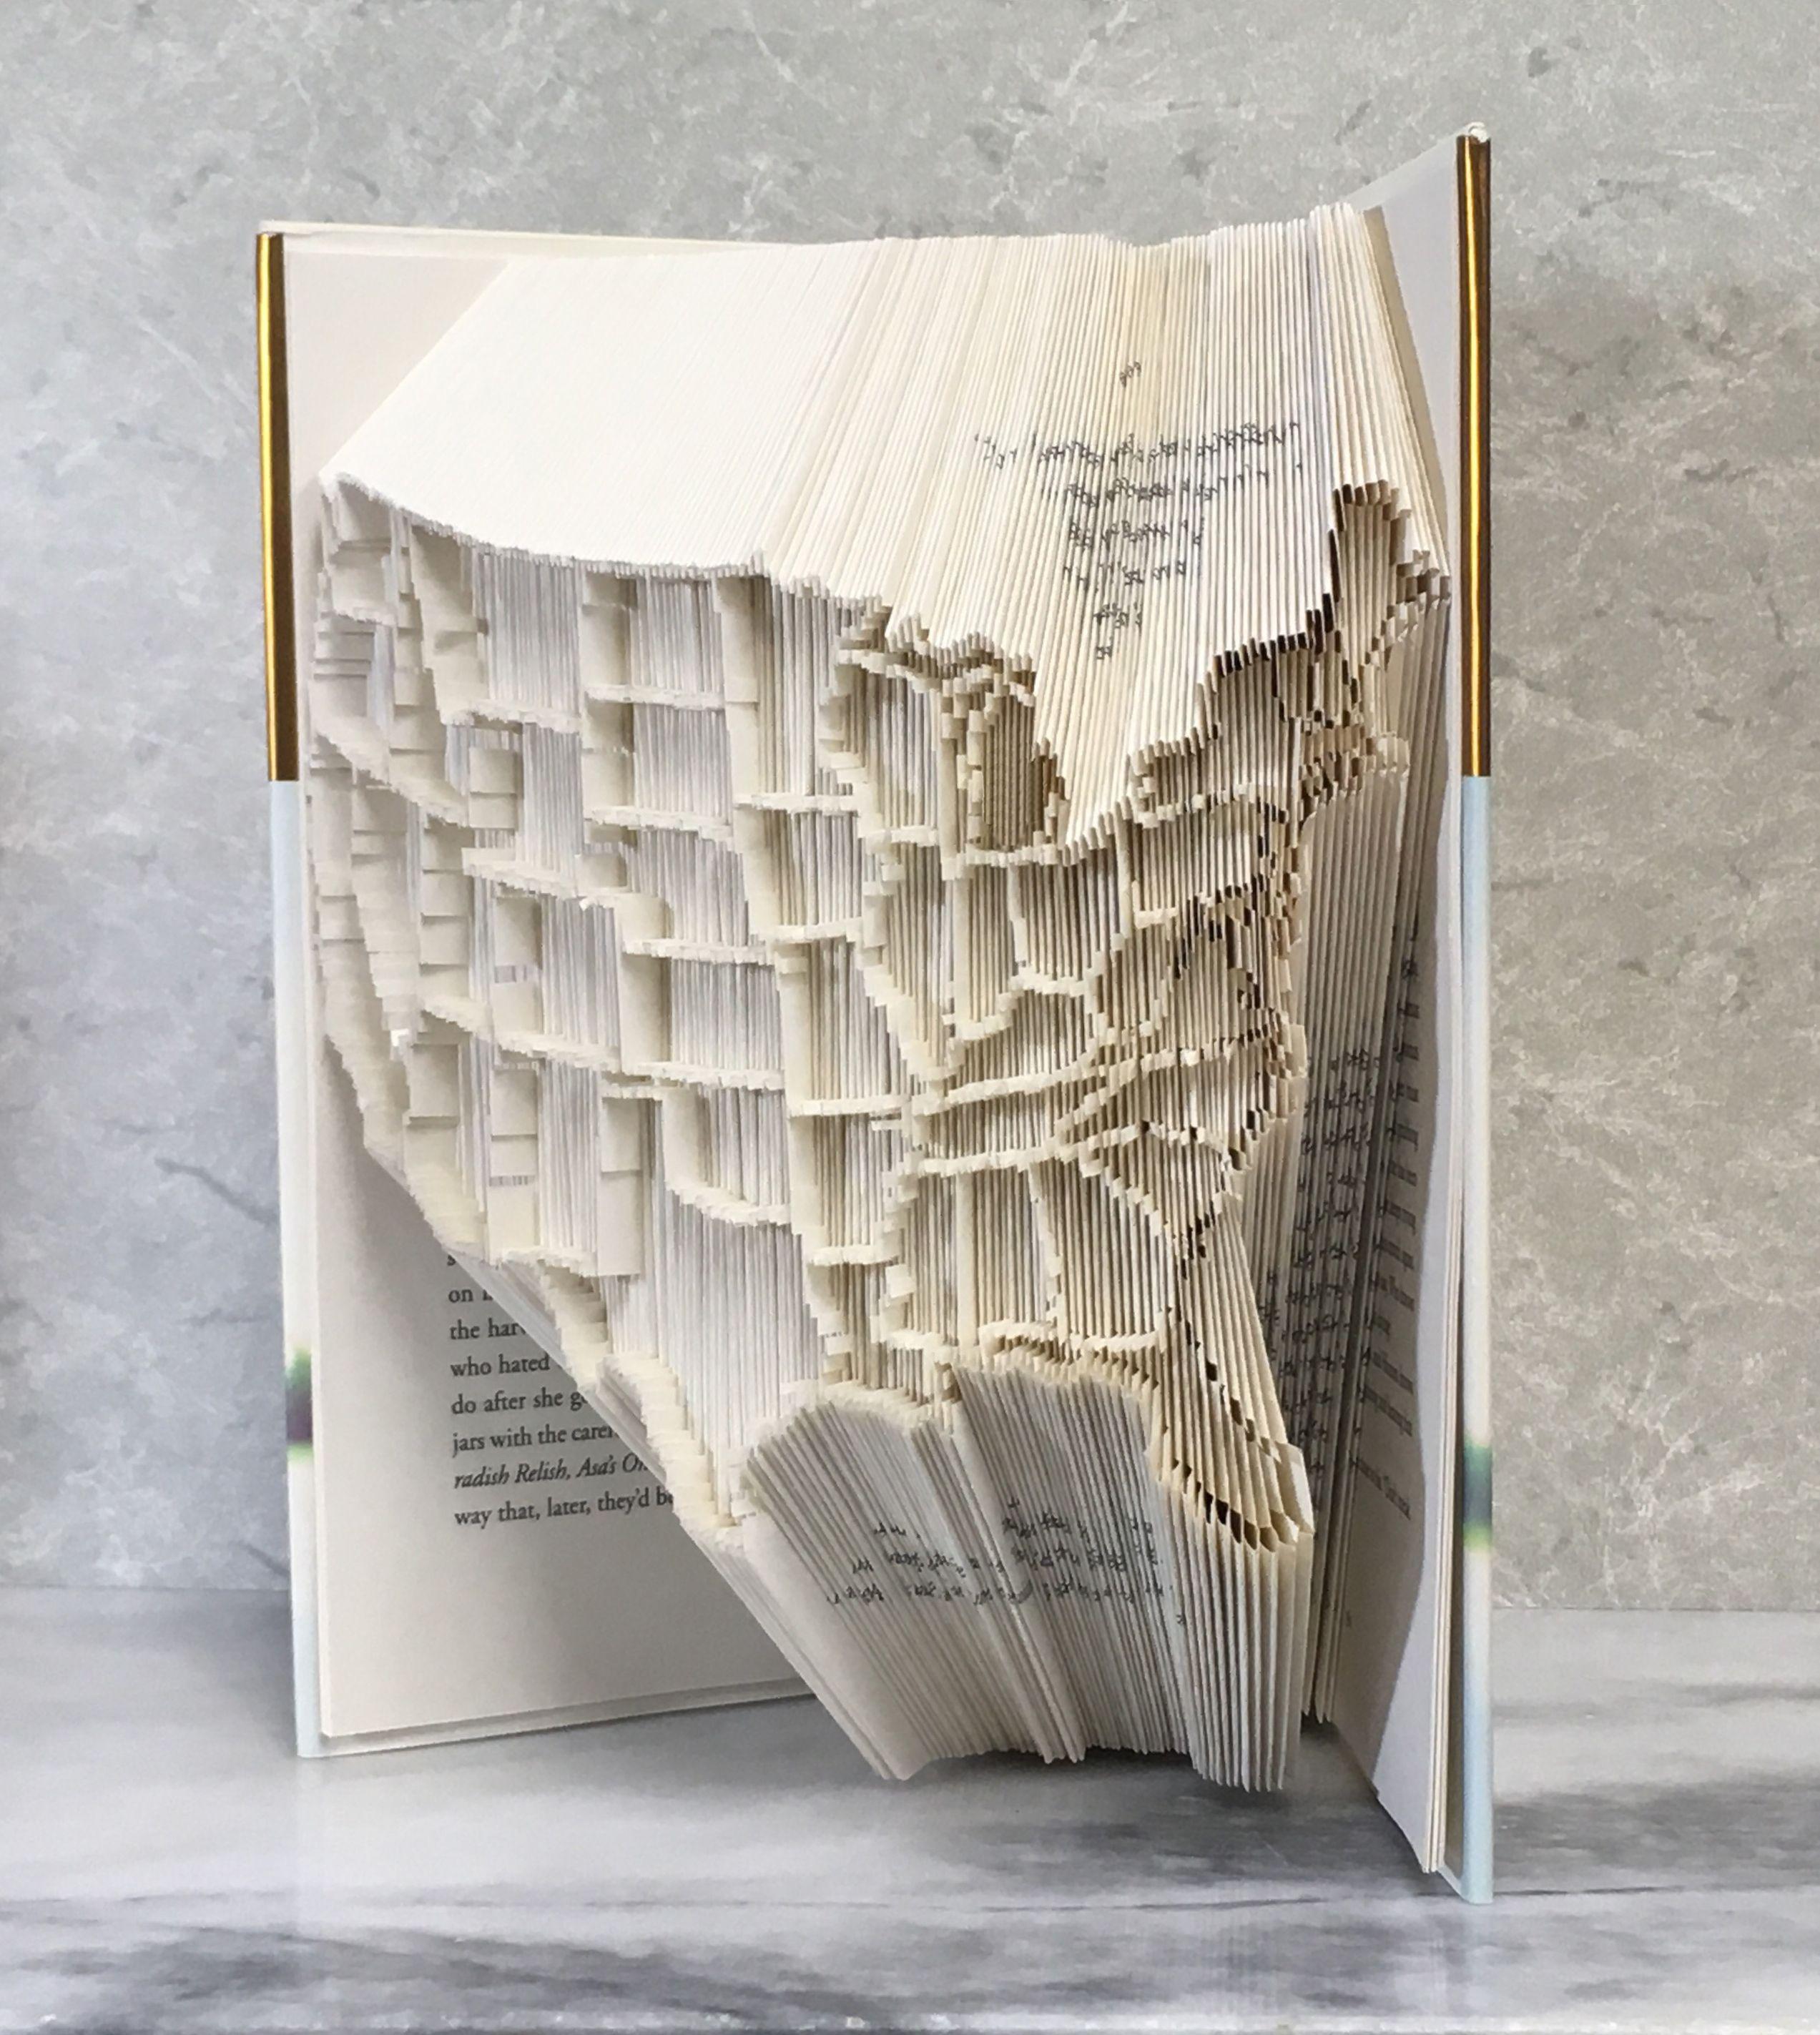 Book Folding Art bookfolding Love To Read I Love Reading Back To School Teacher Gifts Bookfolding Christmas Present For Teachers